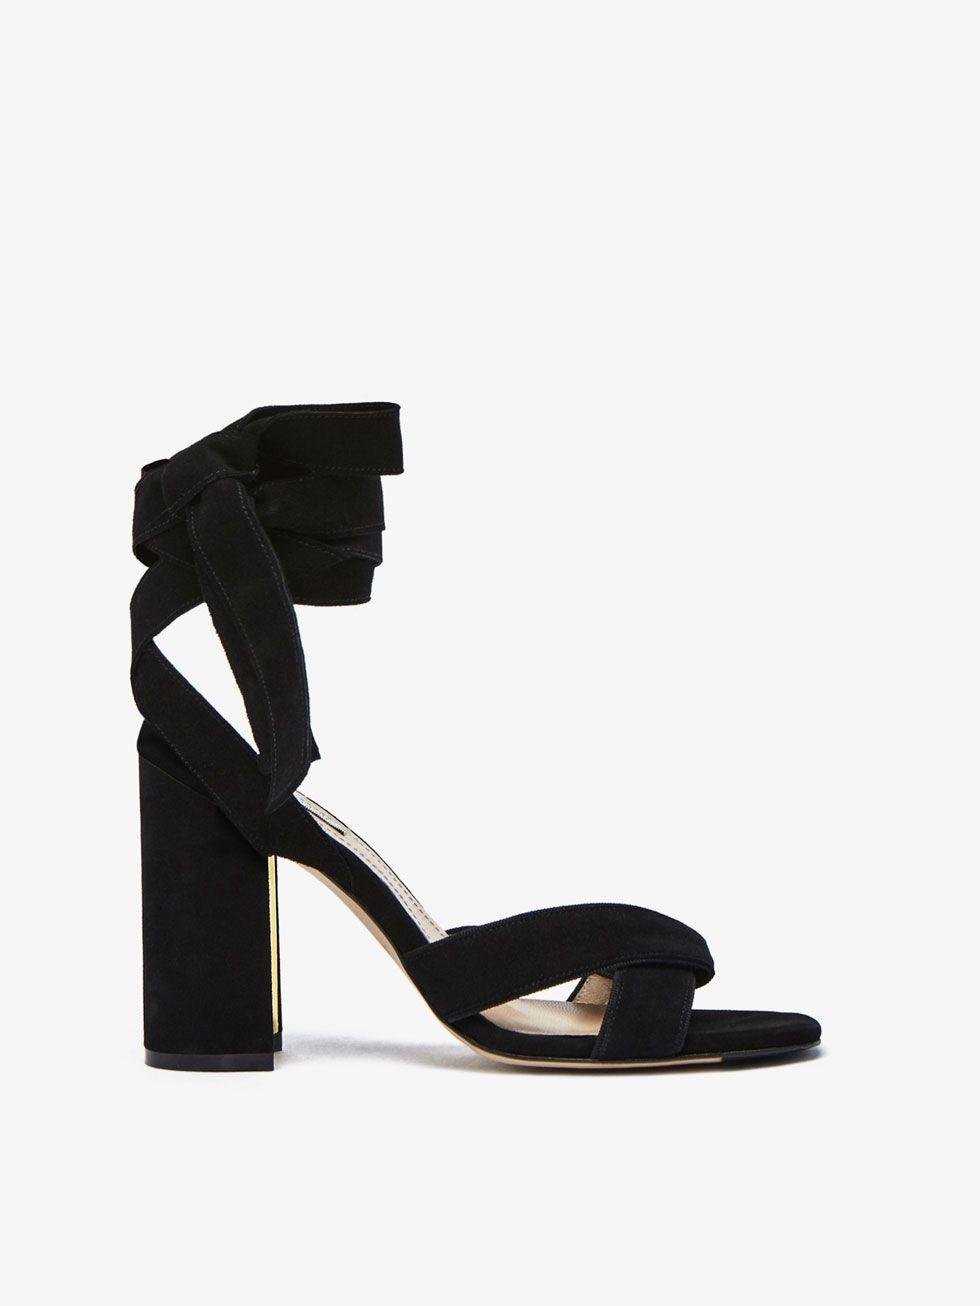 Tacón Limited Sandalia Up Piel Edition De Negra Zapatos Lace Mujer OZkXiuP